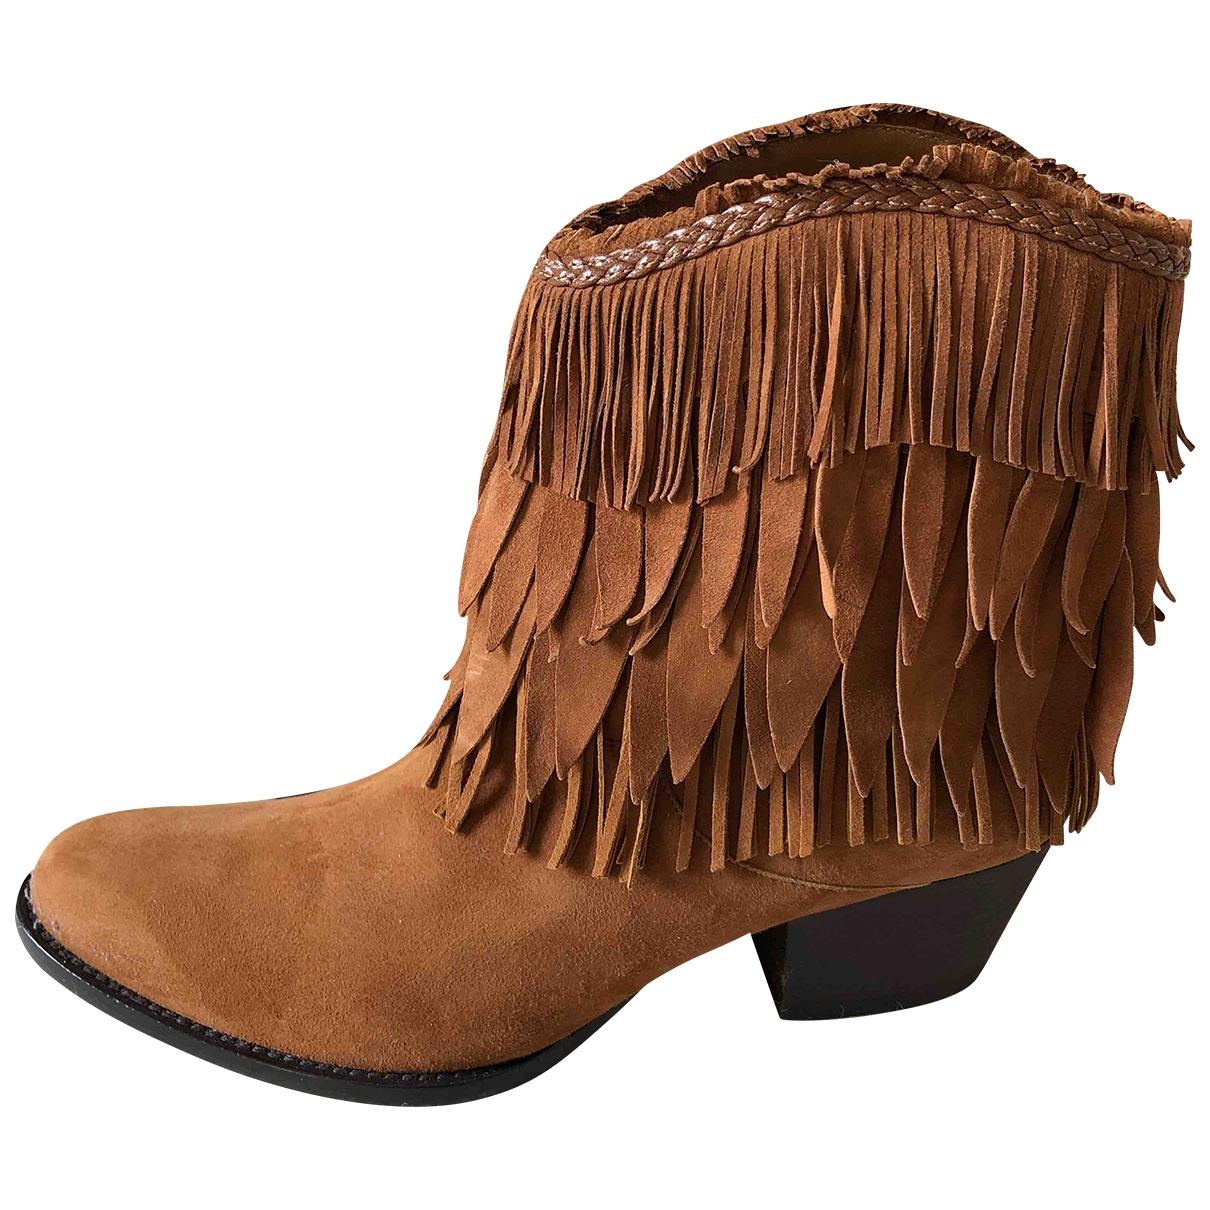 Aquazzura \N Camel Suede Ankle boots for Women 36 EU